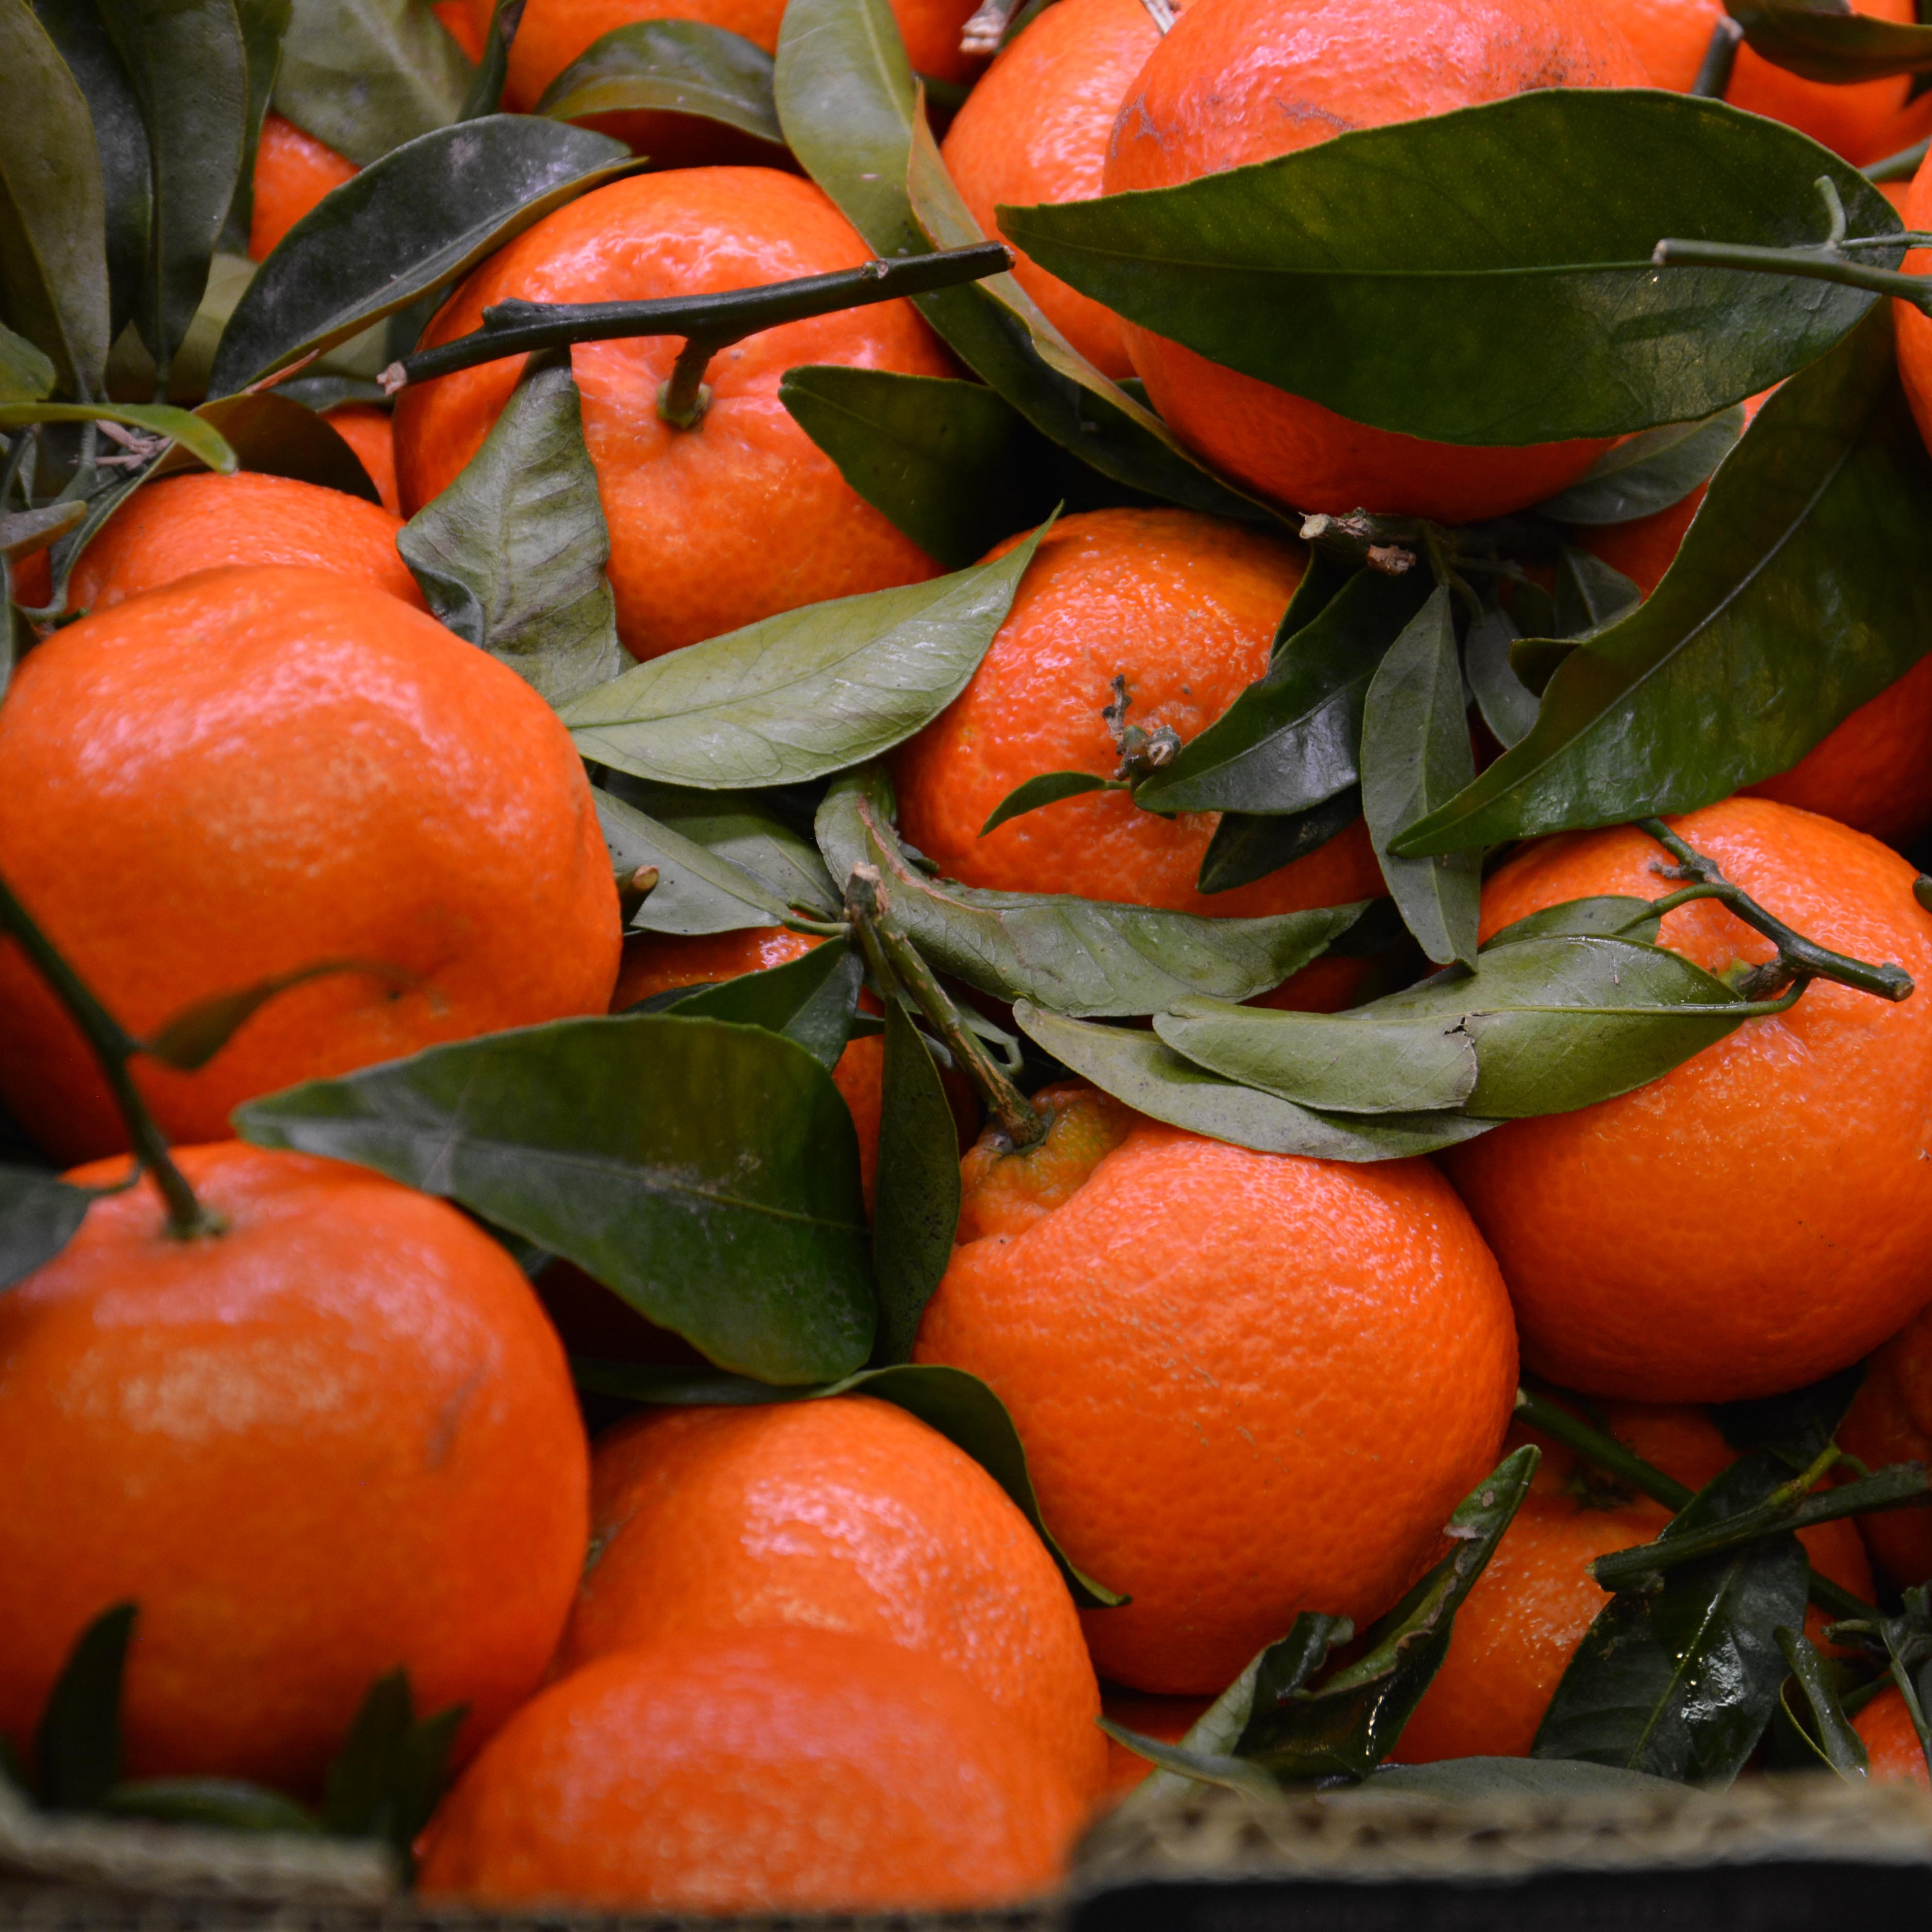 Ovoce azelenina vKredenci